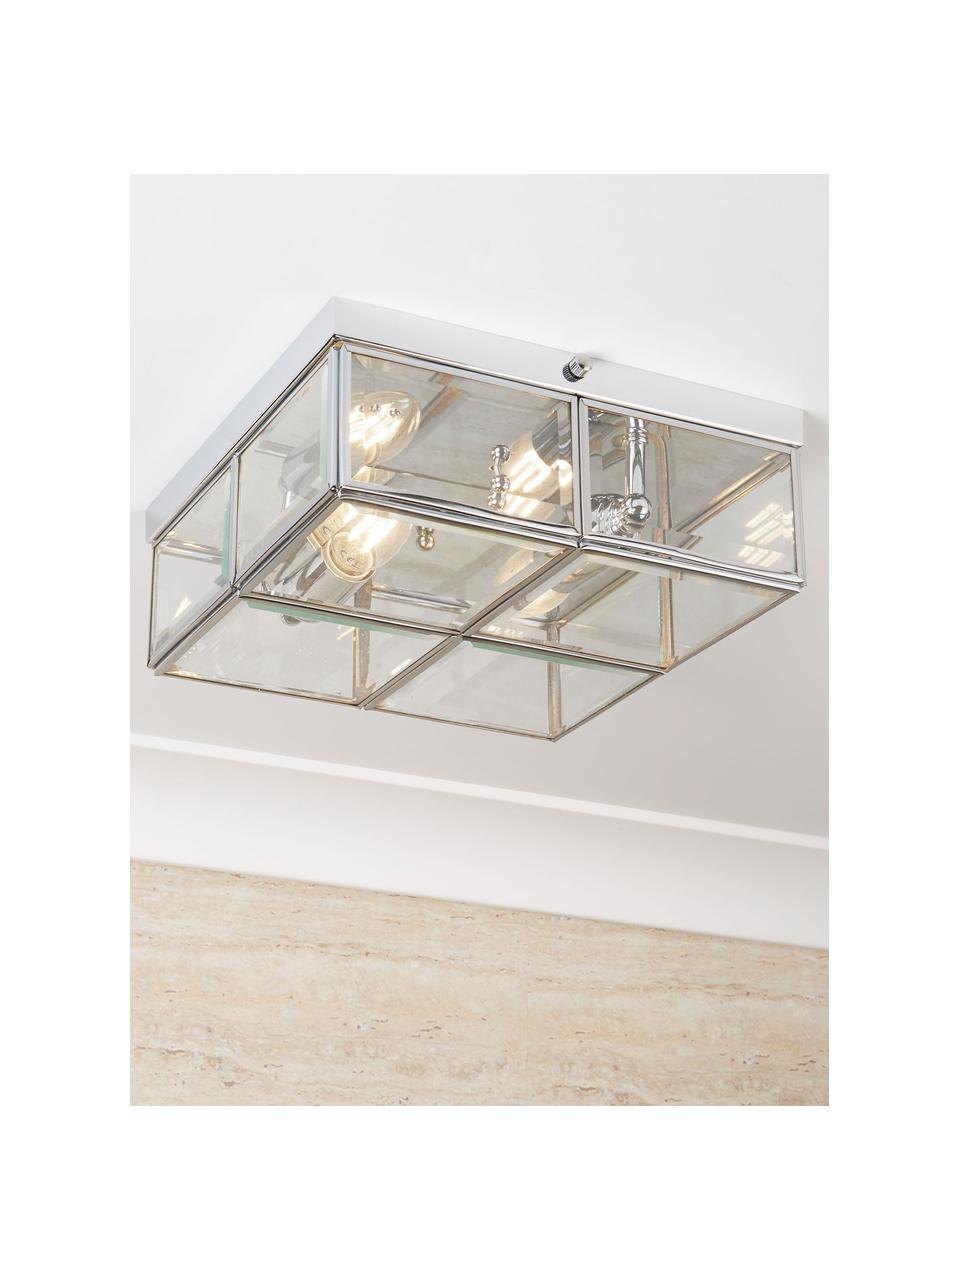 Kleine plafondlamp Ben in chroom, Lampenkap: glas, Chroomkleurig, transparant, 26 x 10 cm